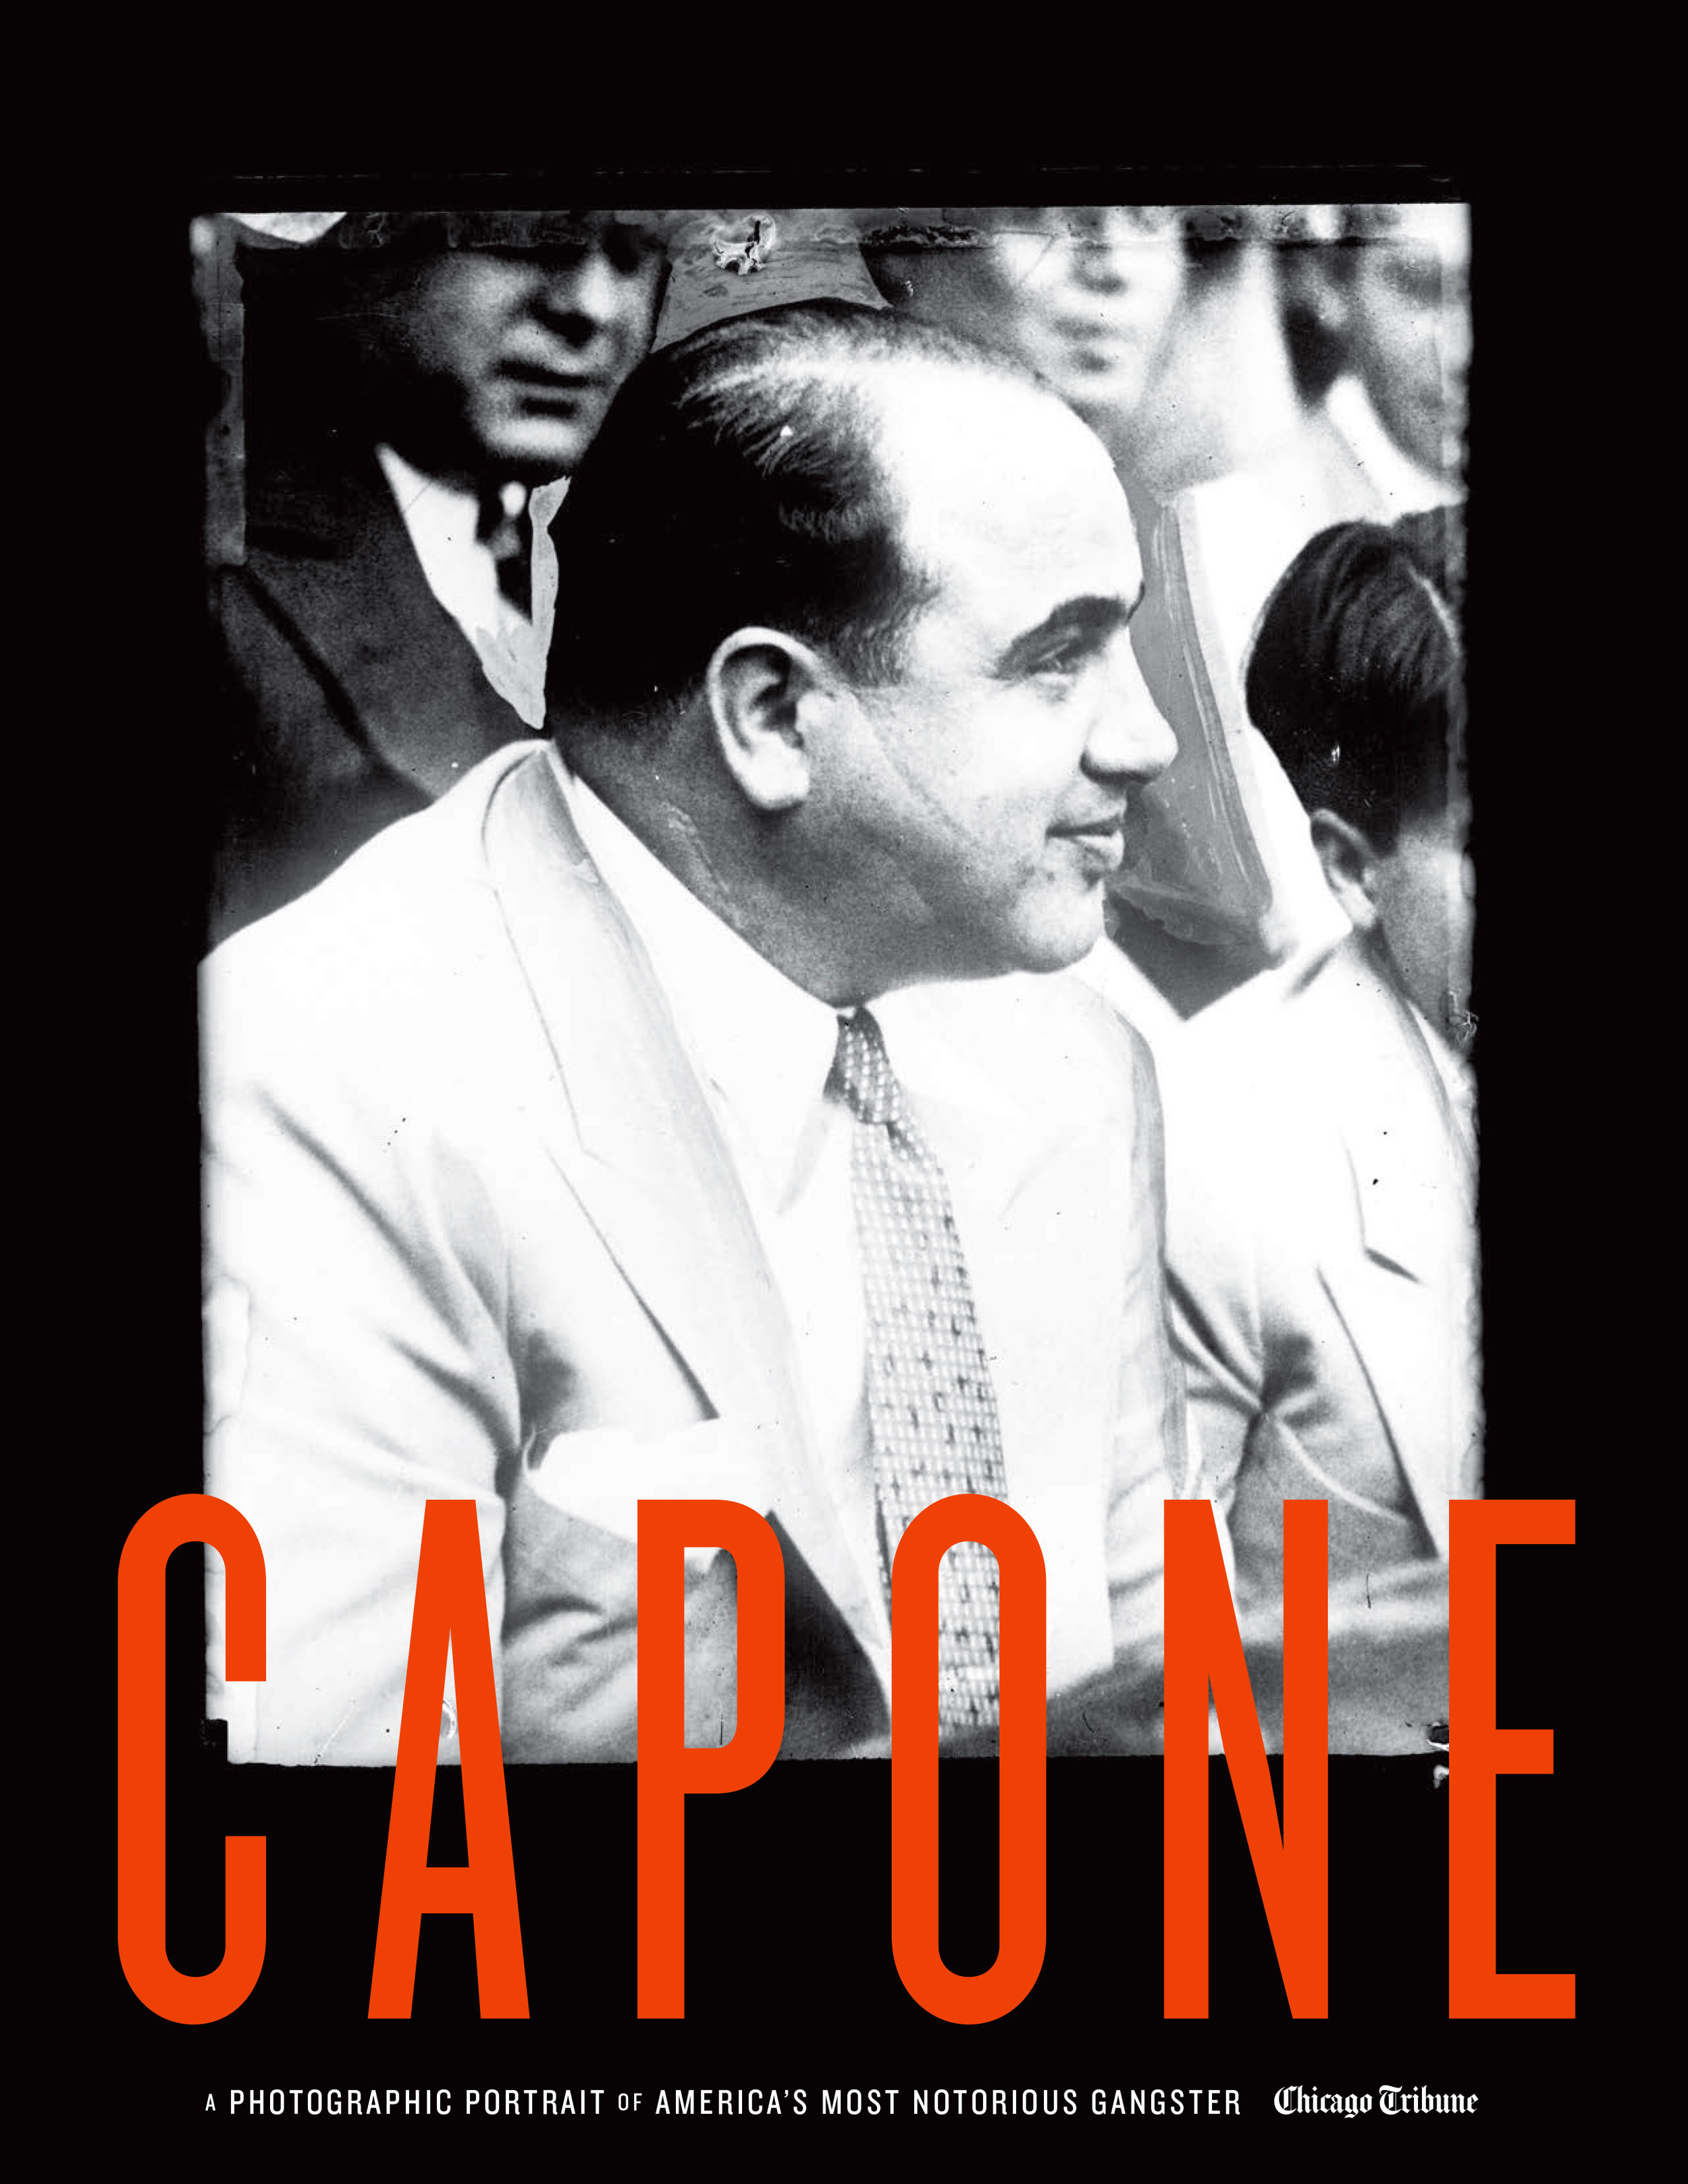 Capone_cover-1.jpg